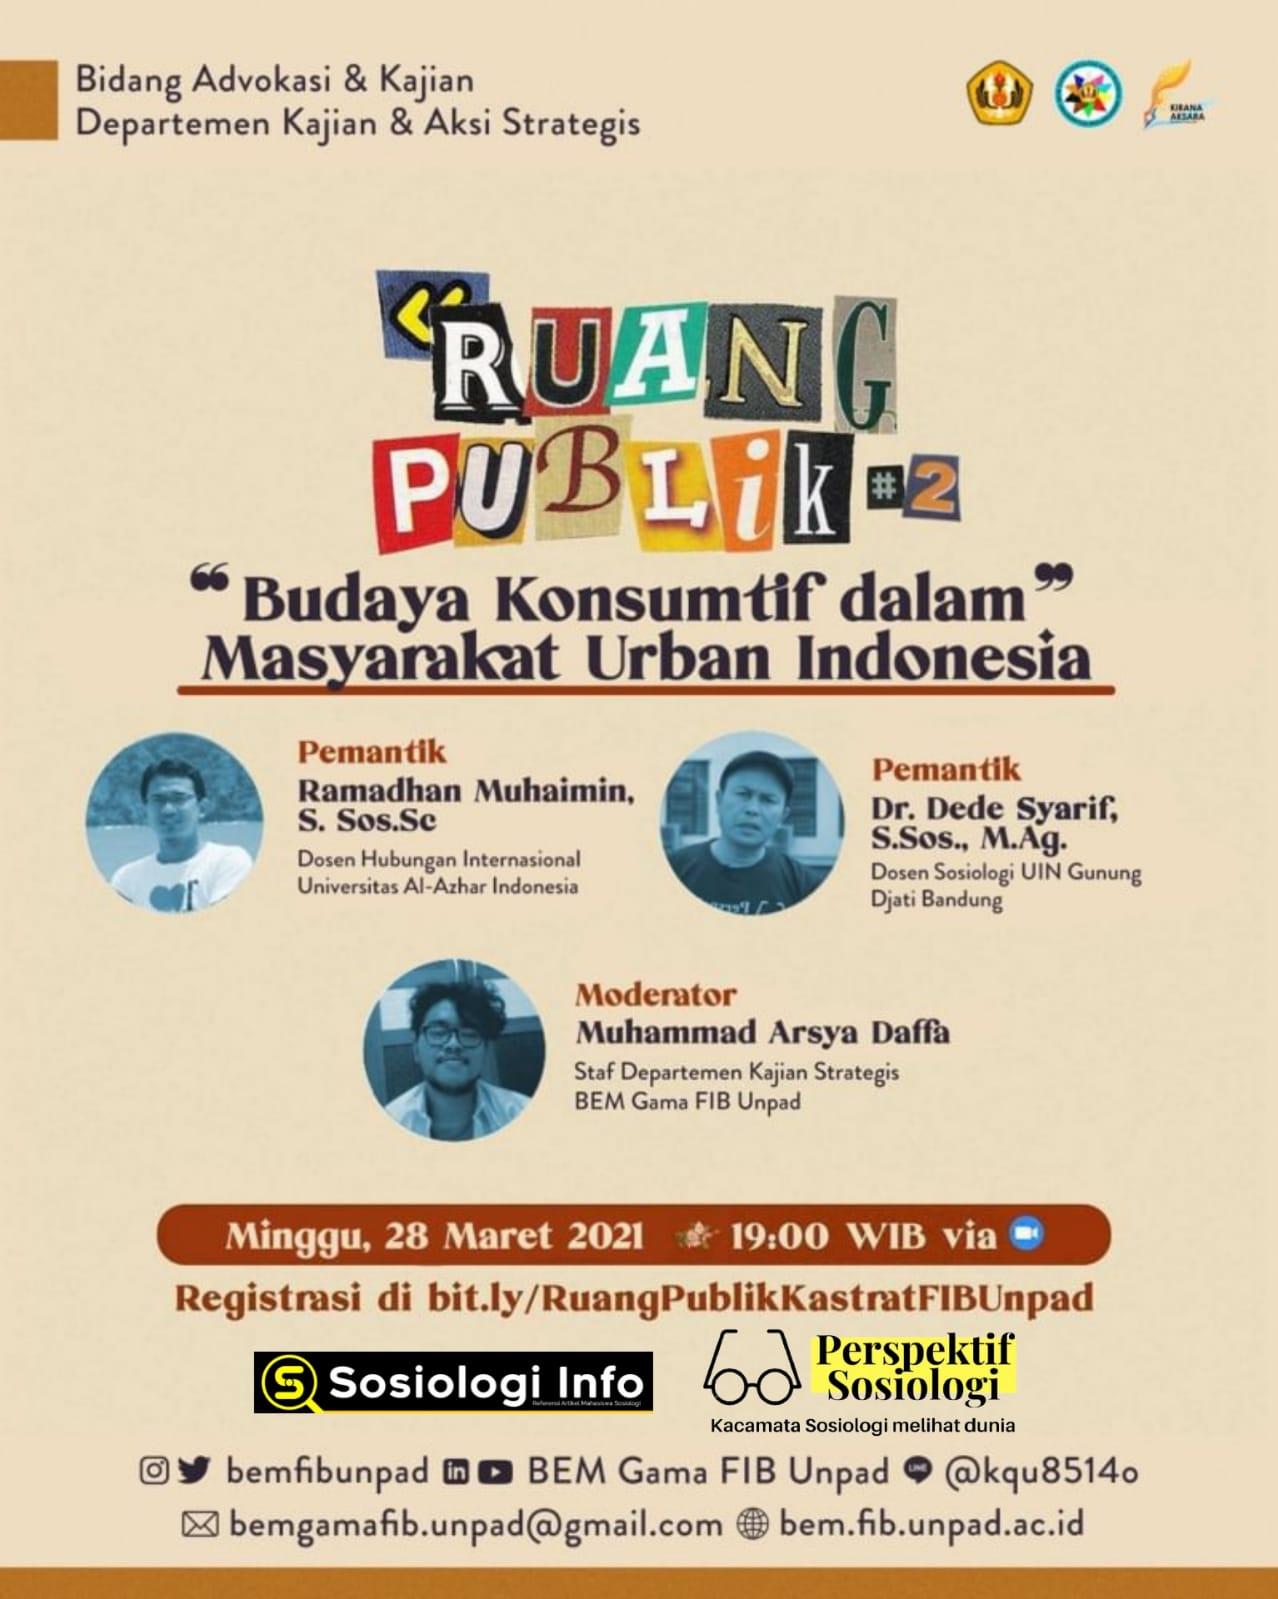 Diskusi Publik 28 Maret 2021, Tema : Budaya Konsumtif dalam Masyarakat Urban, Memahami Teori dan Fenomena Sosialnya